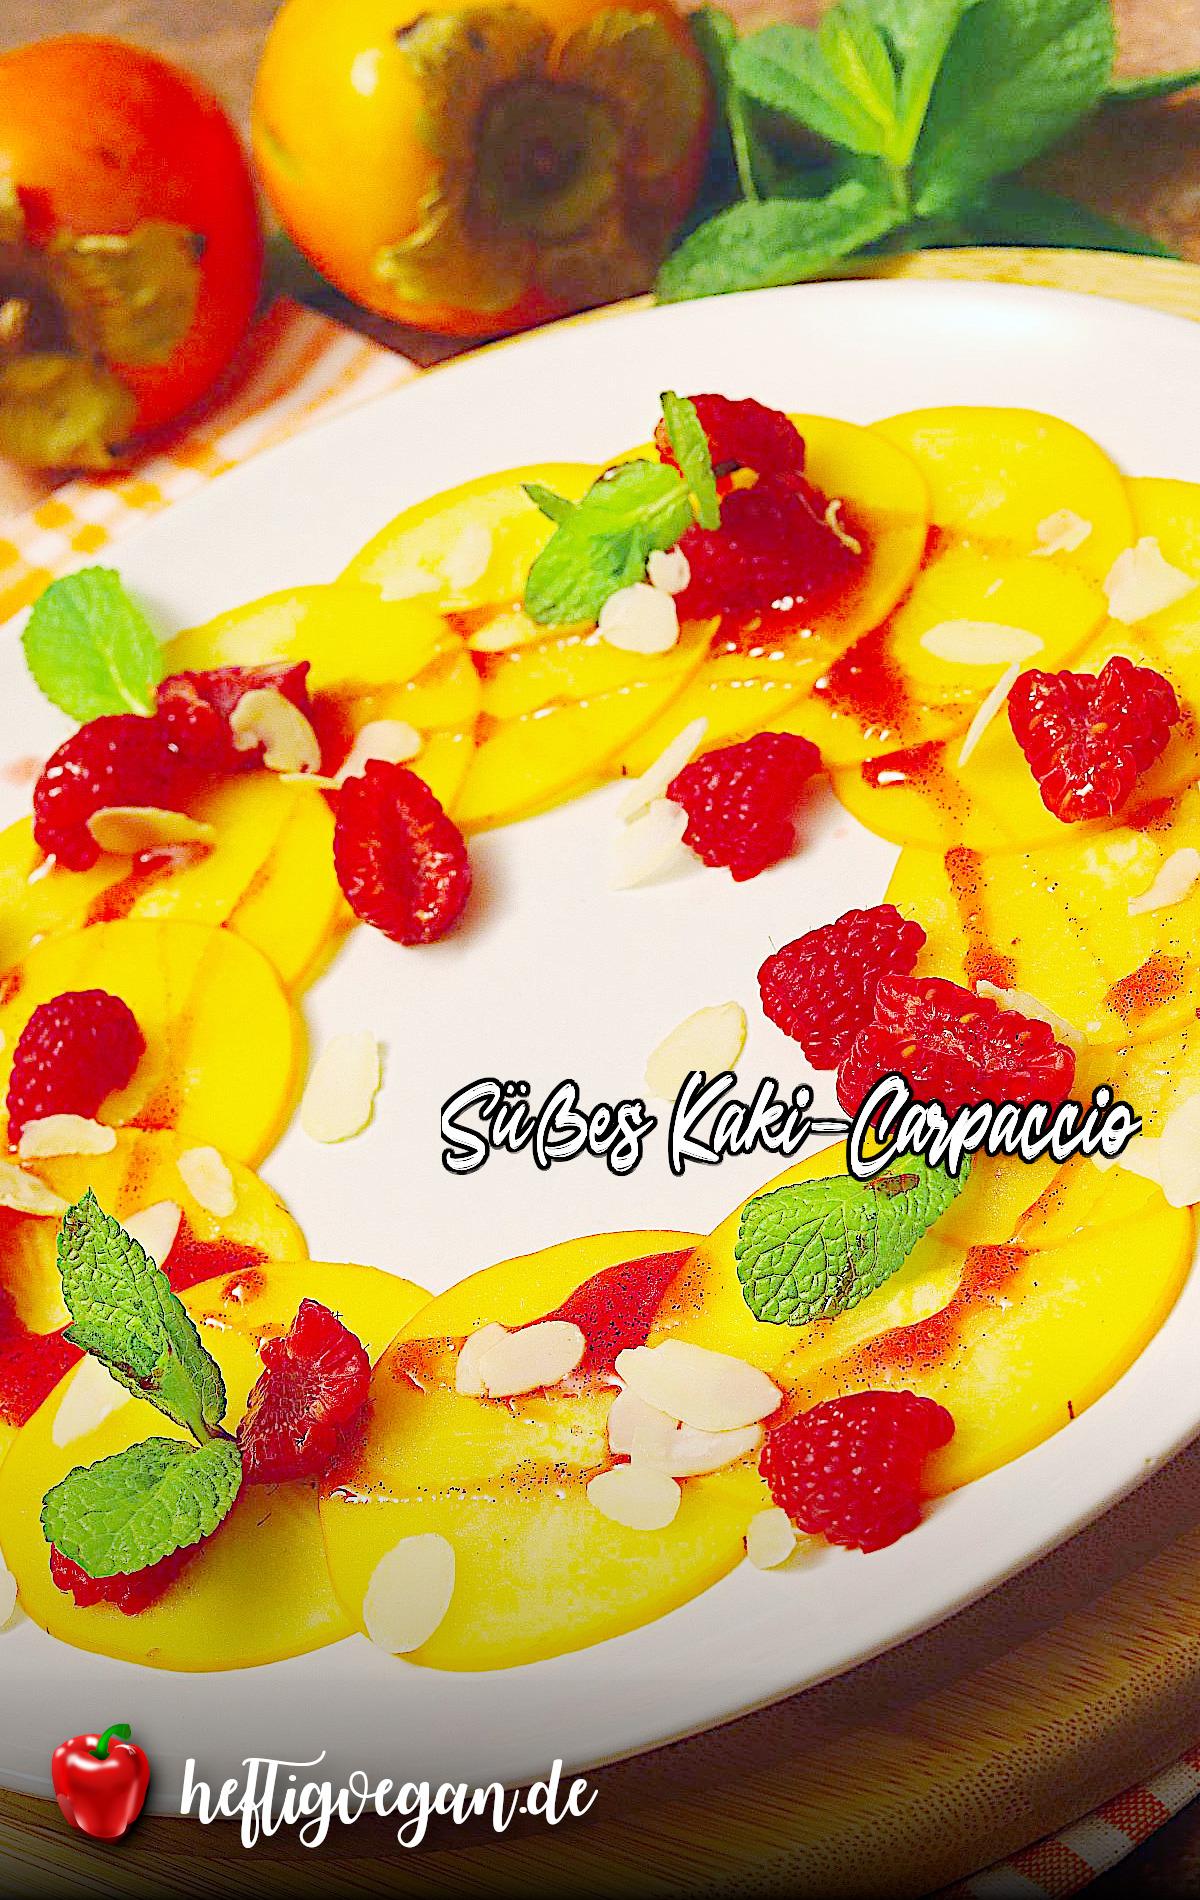 Süßes Kaki-Carpaccio auf Pinterest